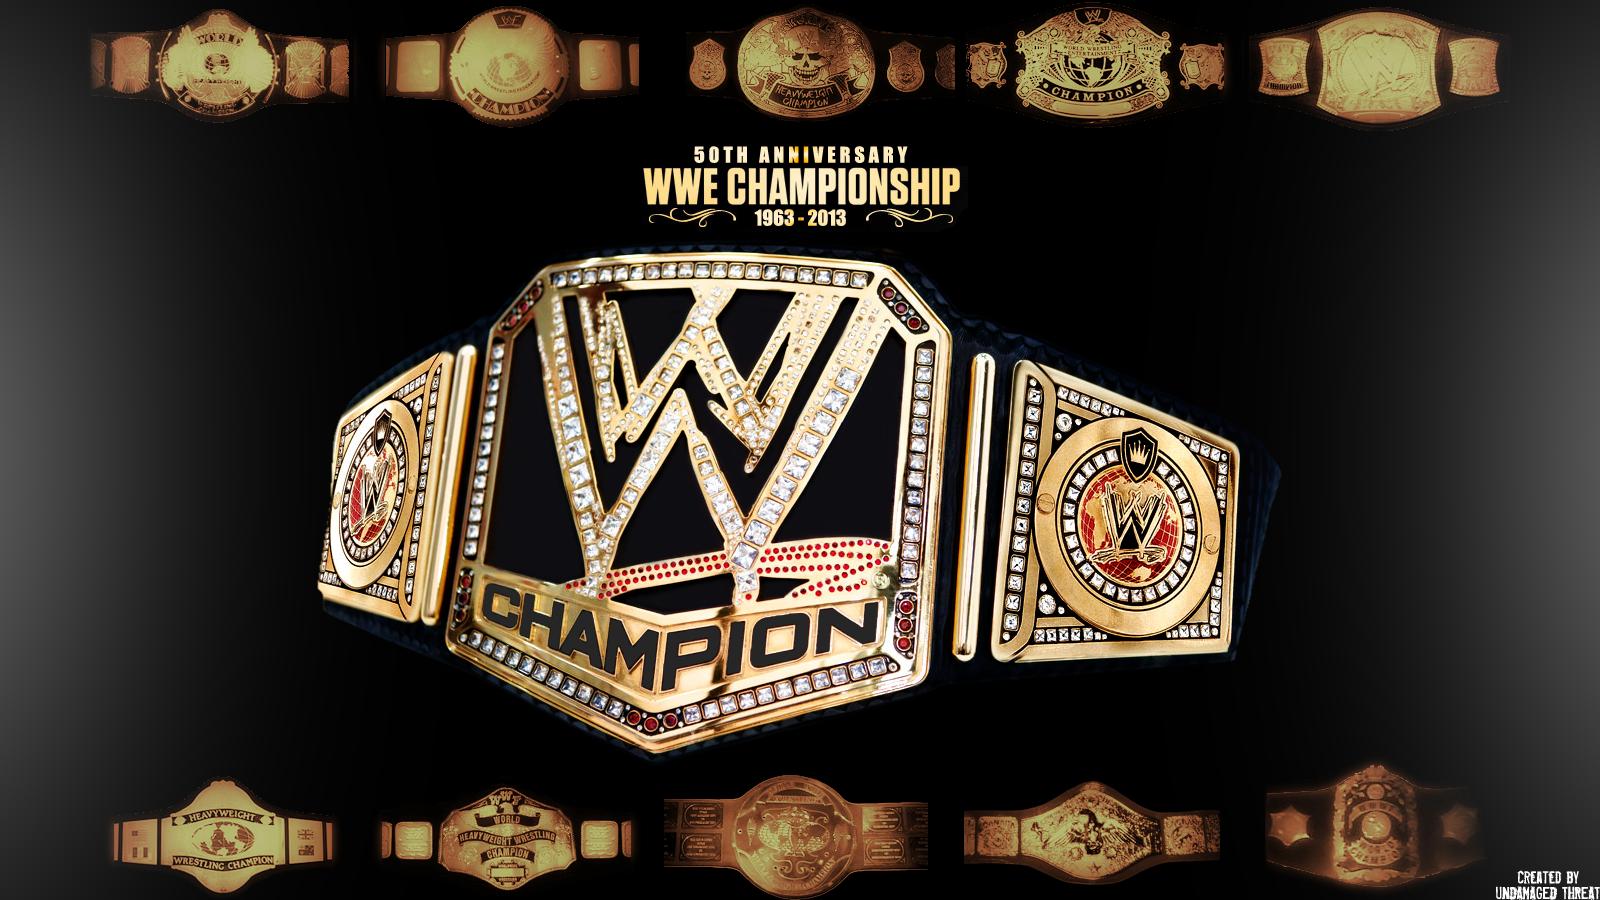 WWE Championship 50th Anniversary Wallpaper created by Undamaged 1600x900